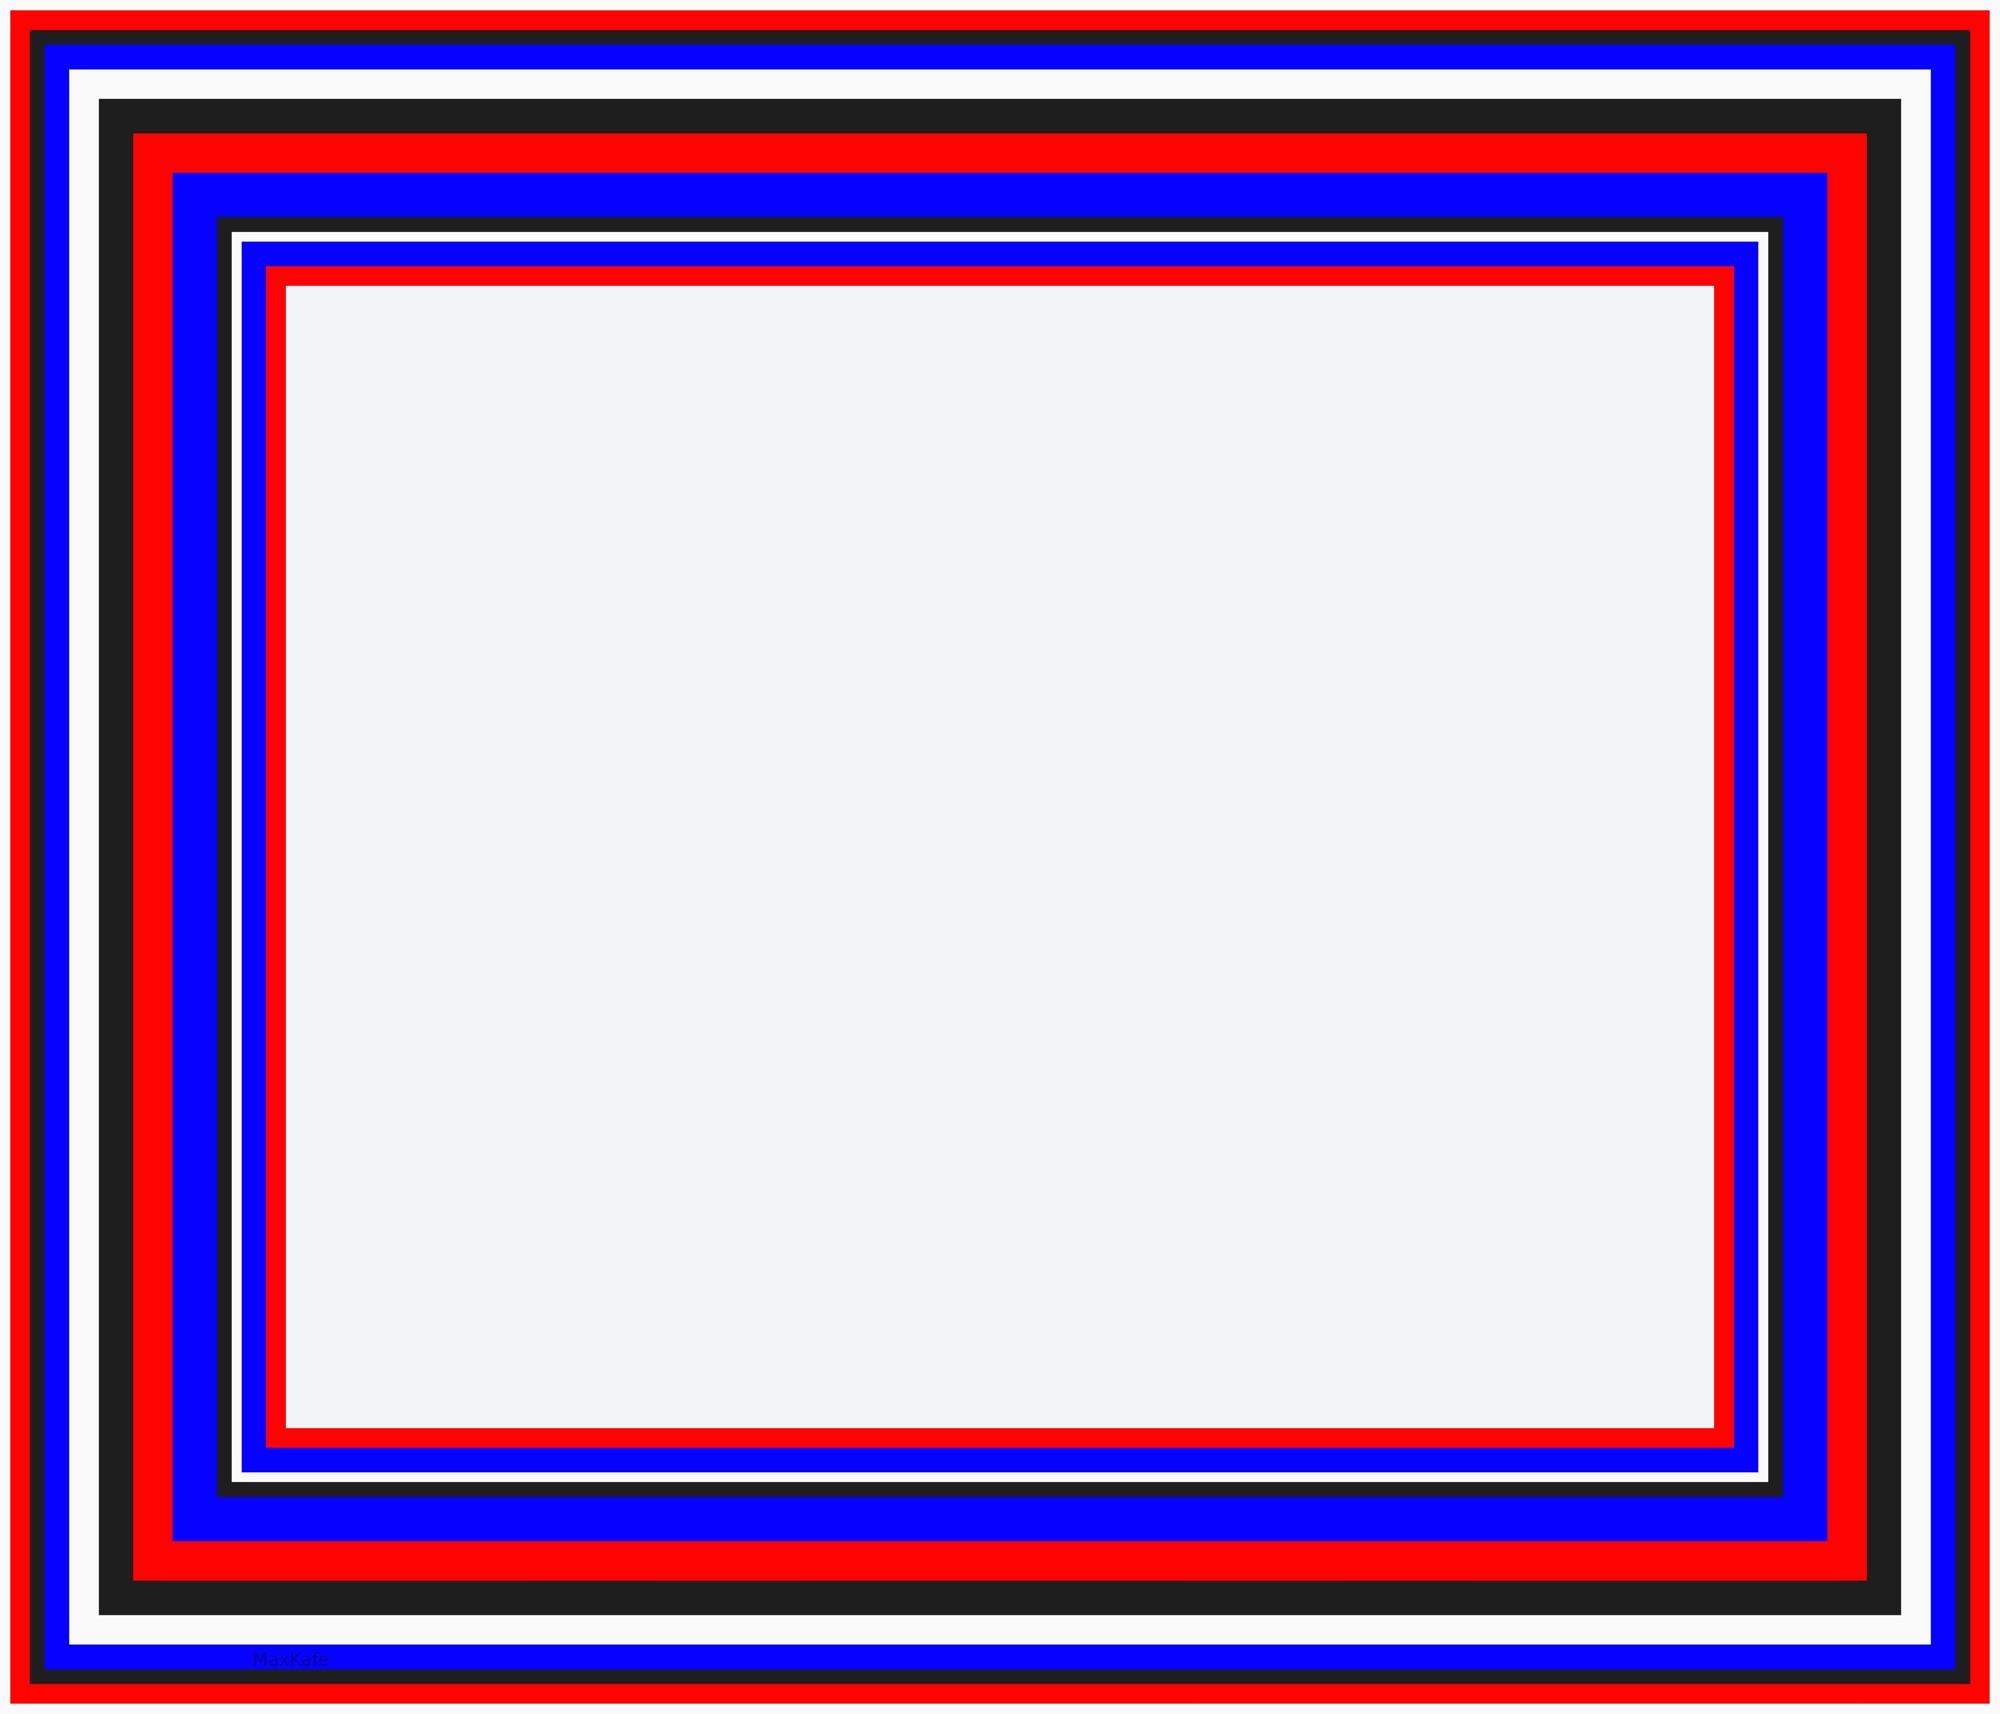 "MK16LFS106 Frame 6x7 Black White Red Blue <a href=""https://dl.orangedox.com/K47RI0"">[DOWNLOAD]</a>"